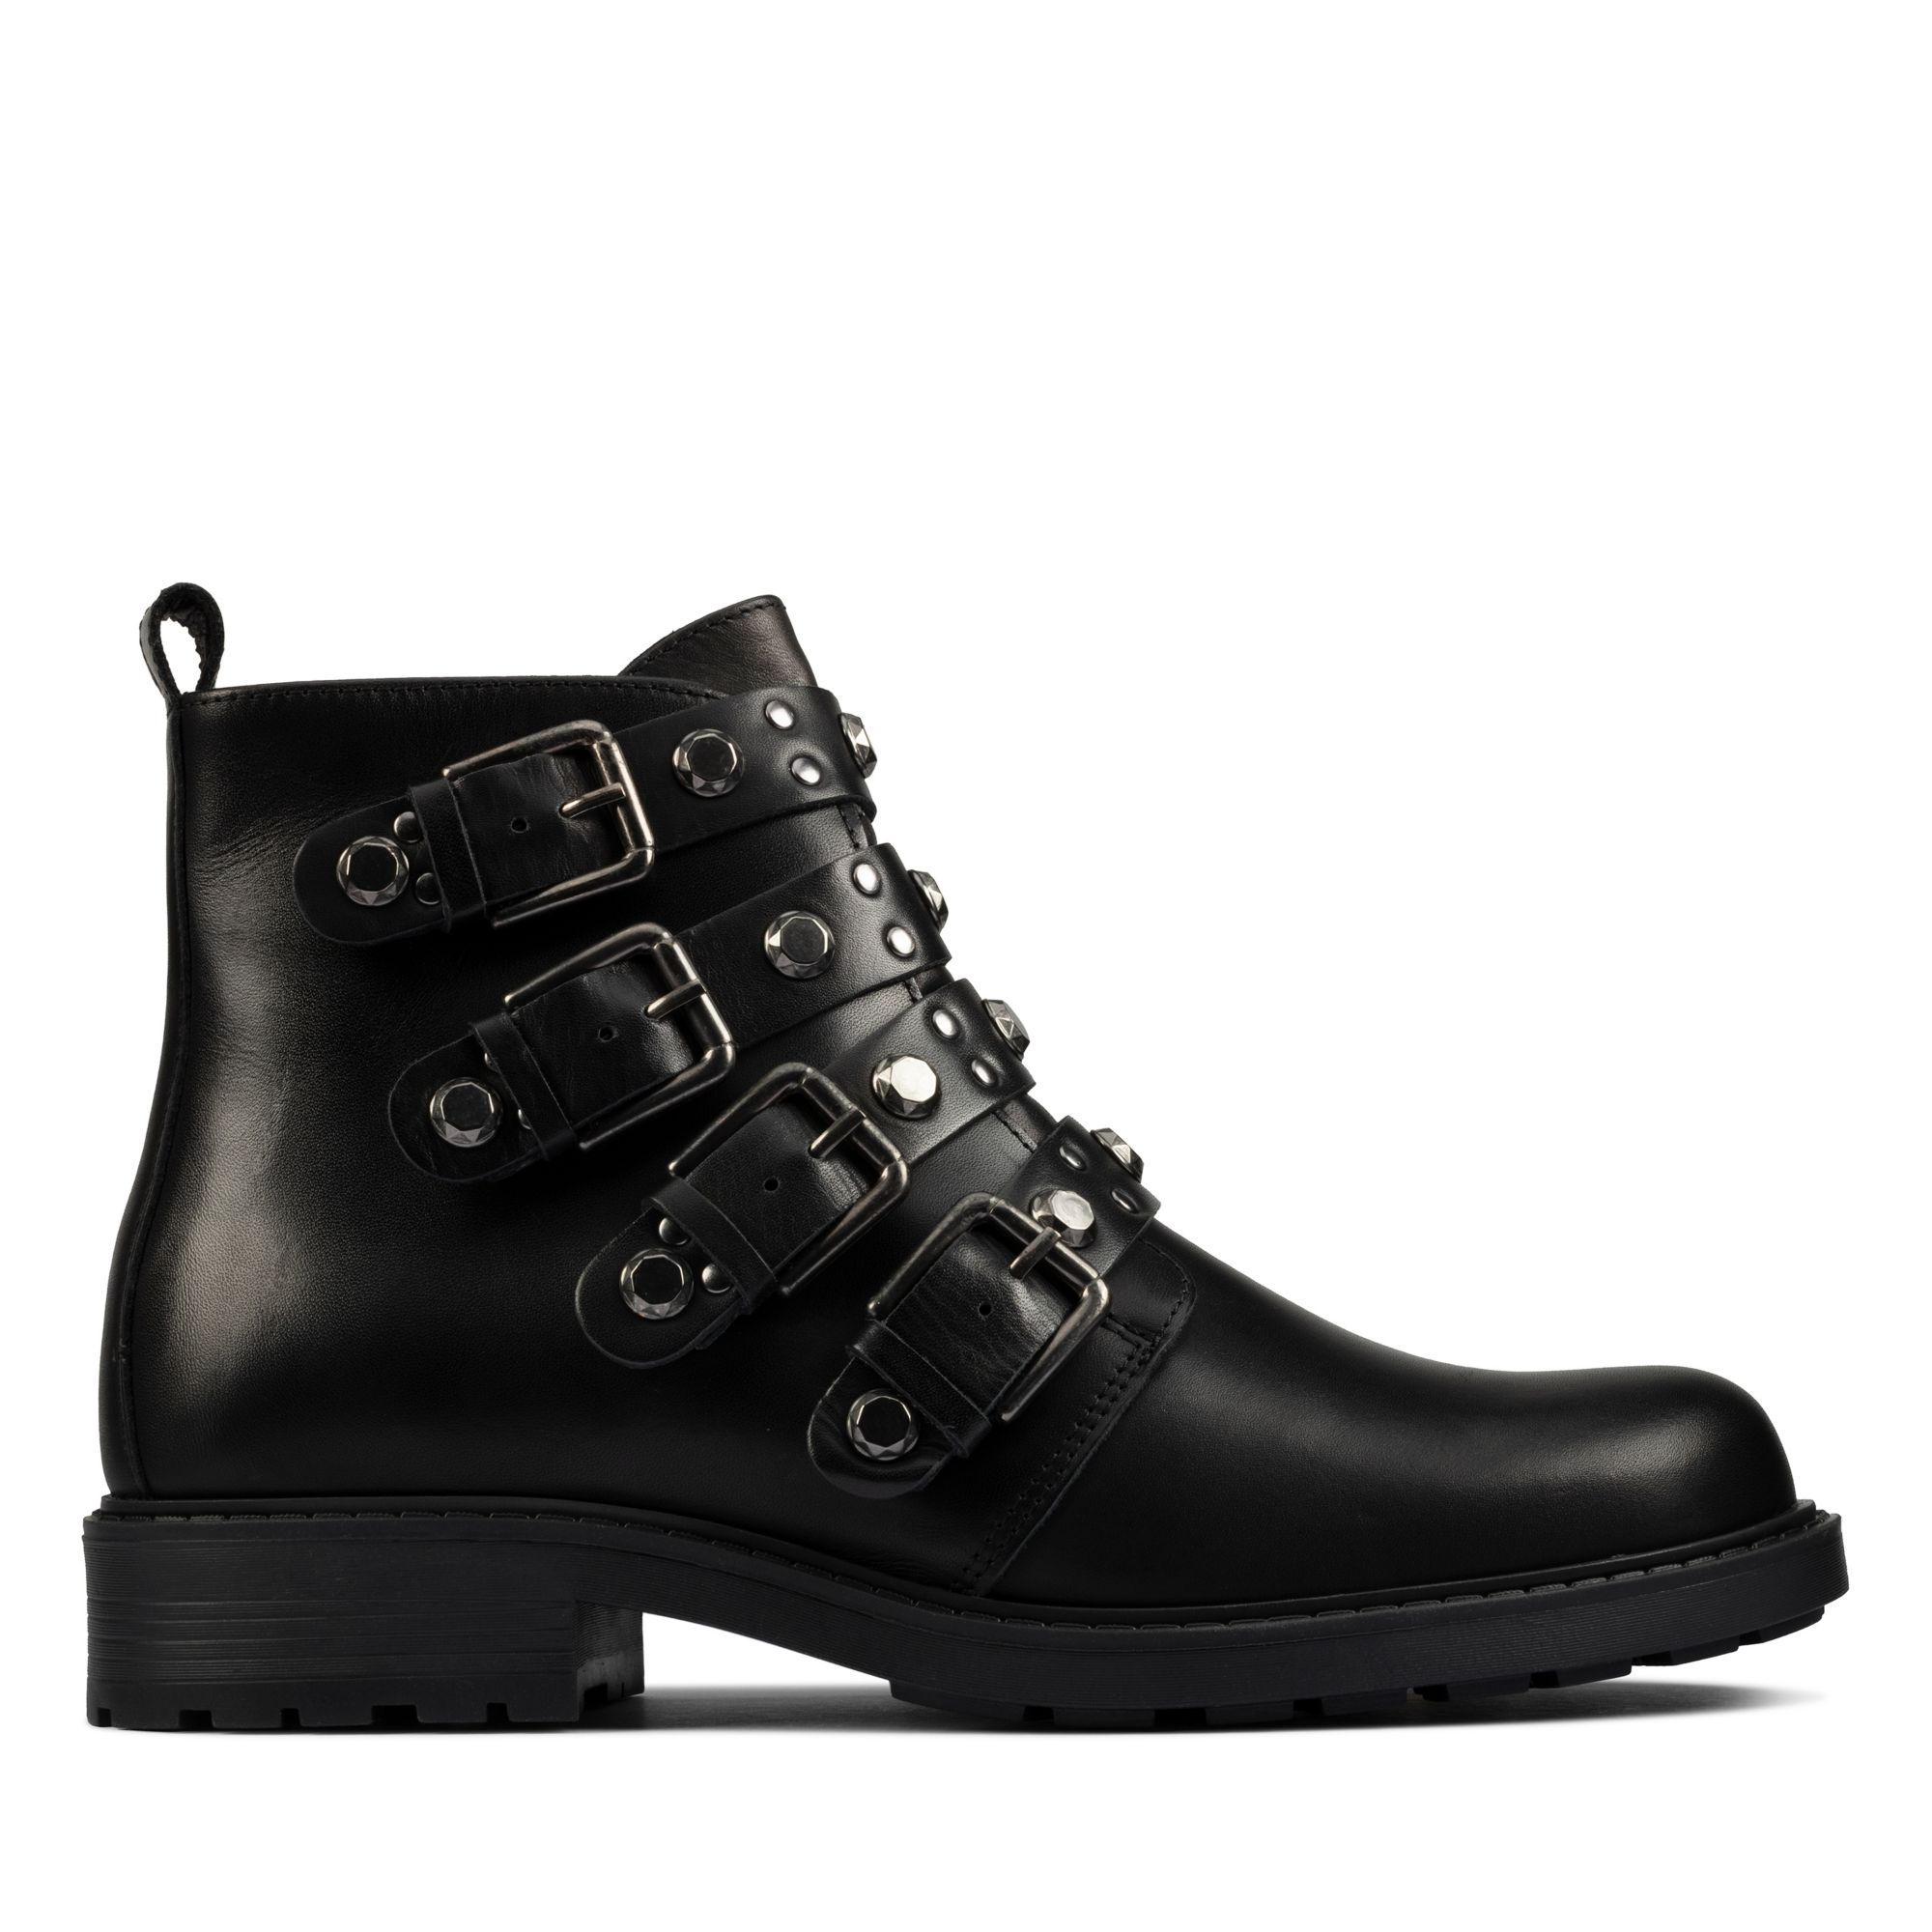 Clarks Orinoco  2 Strap – Leather